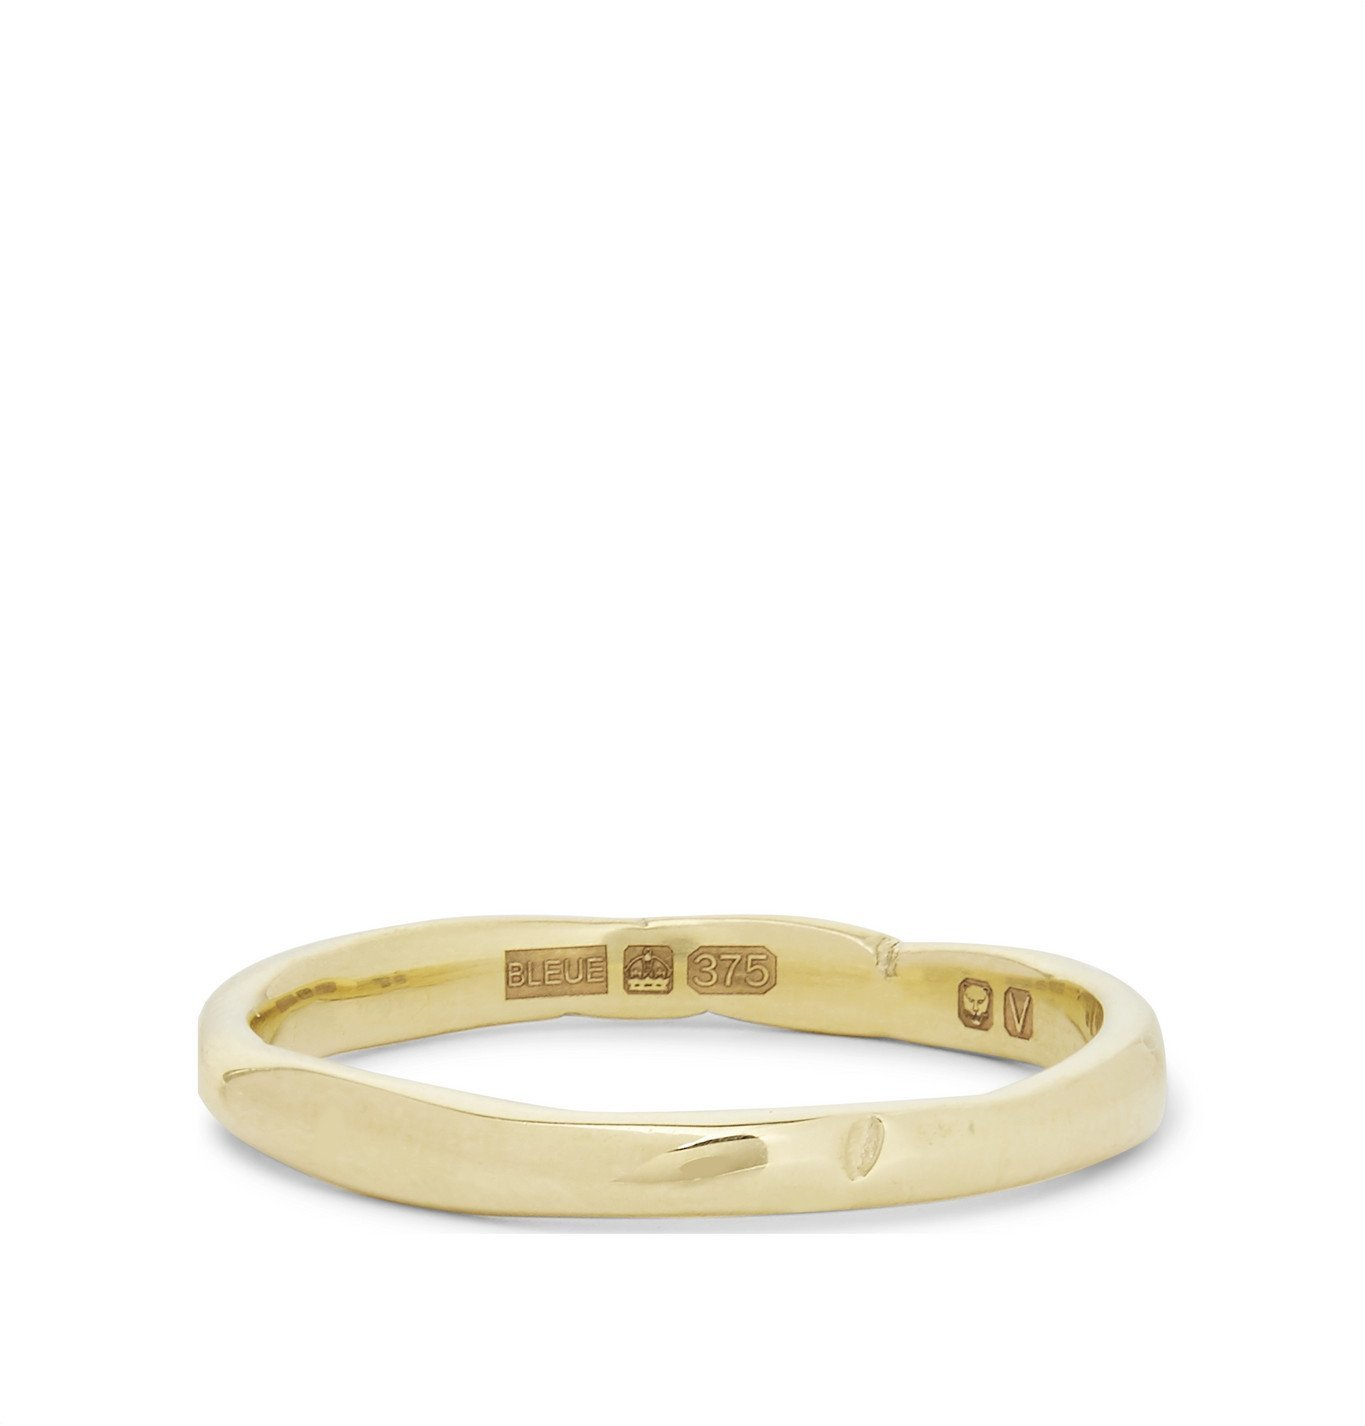 Photo: Bleue Burnham - The Stem 9-Karat Gold Ring - Gold